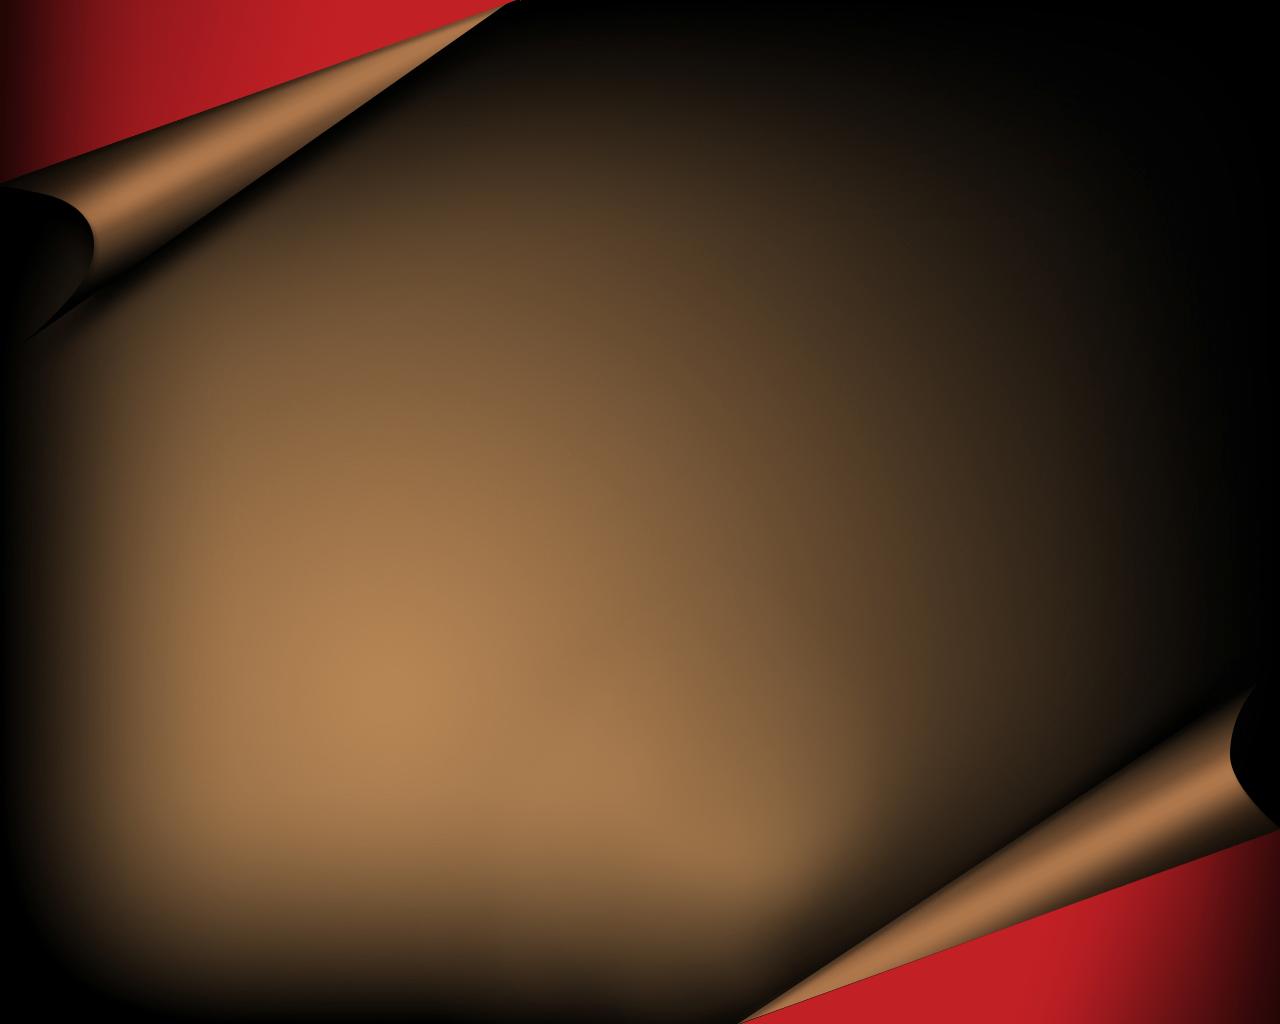 background-22